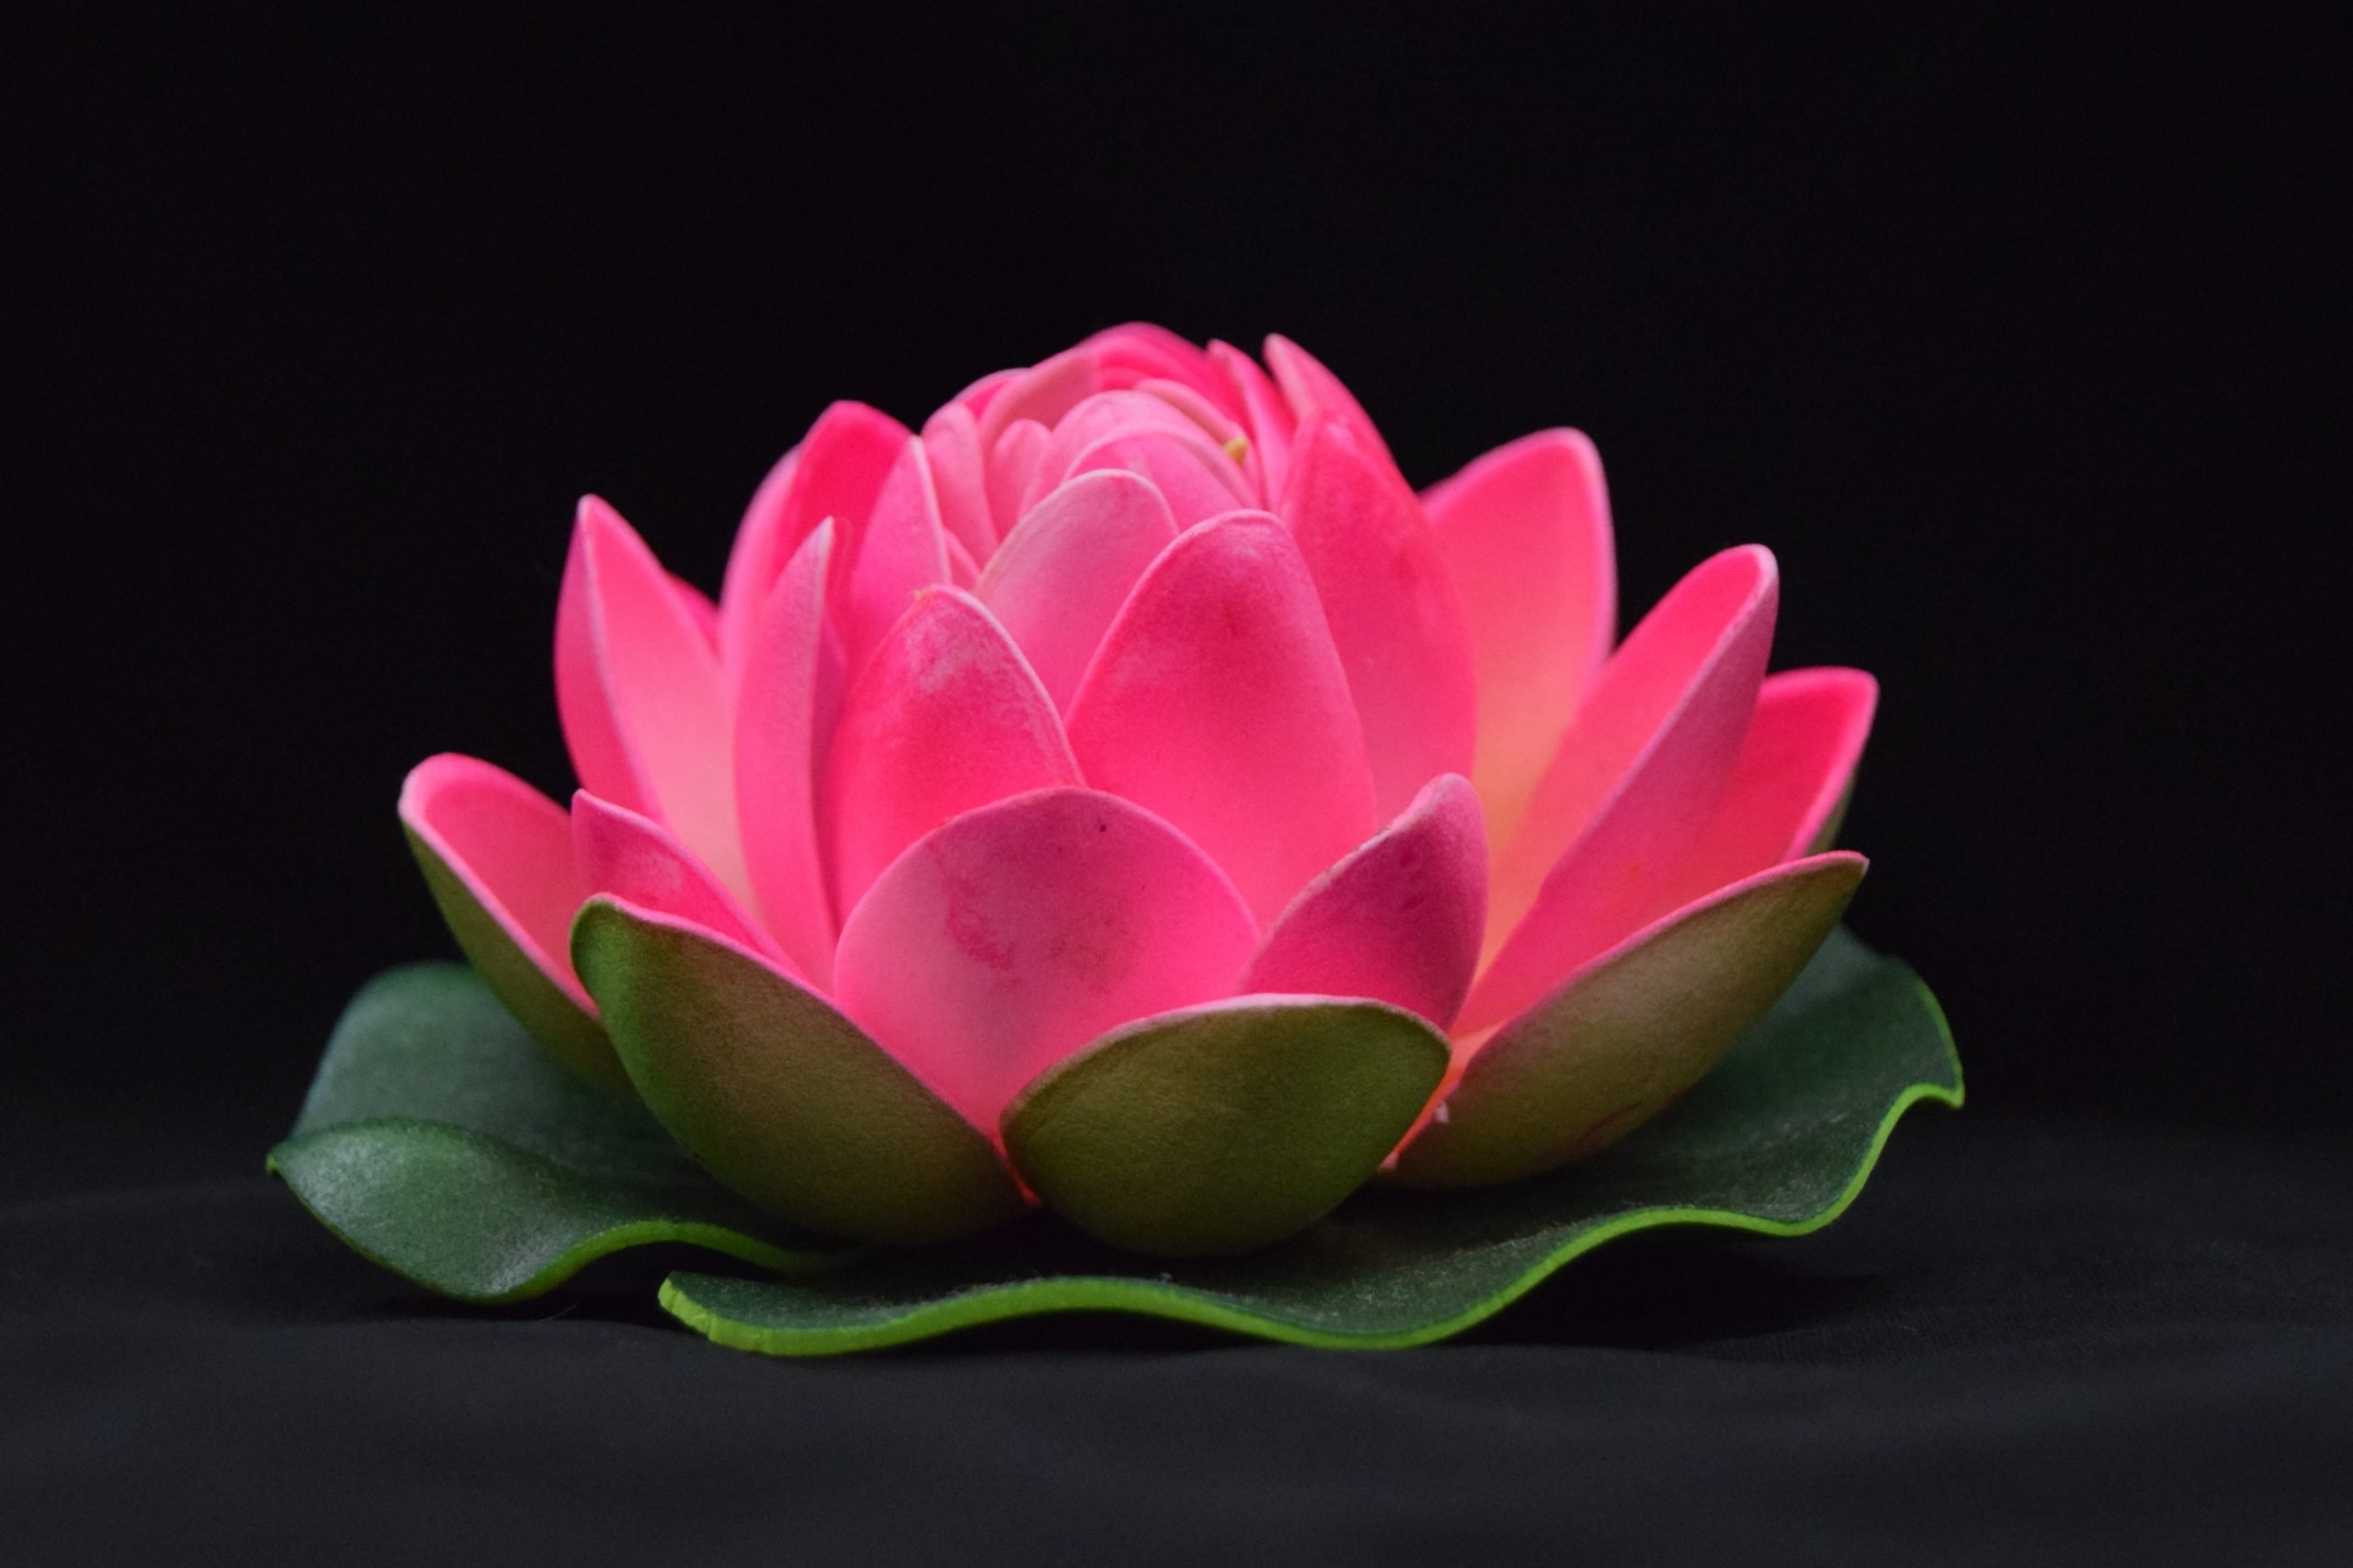 Pink Sacred lotus on focus